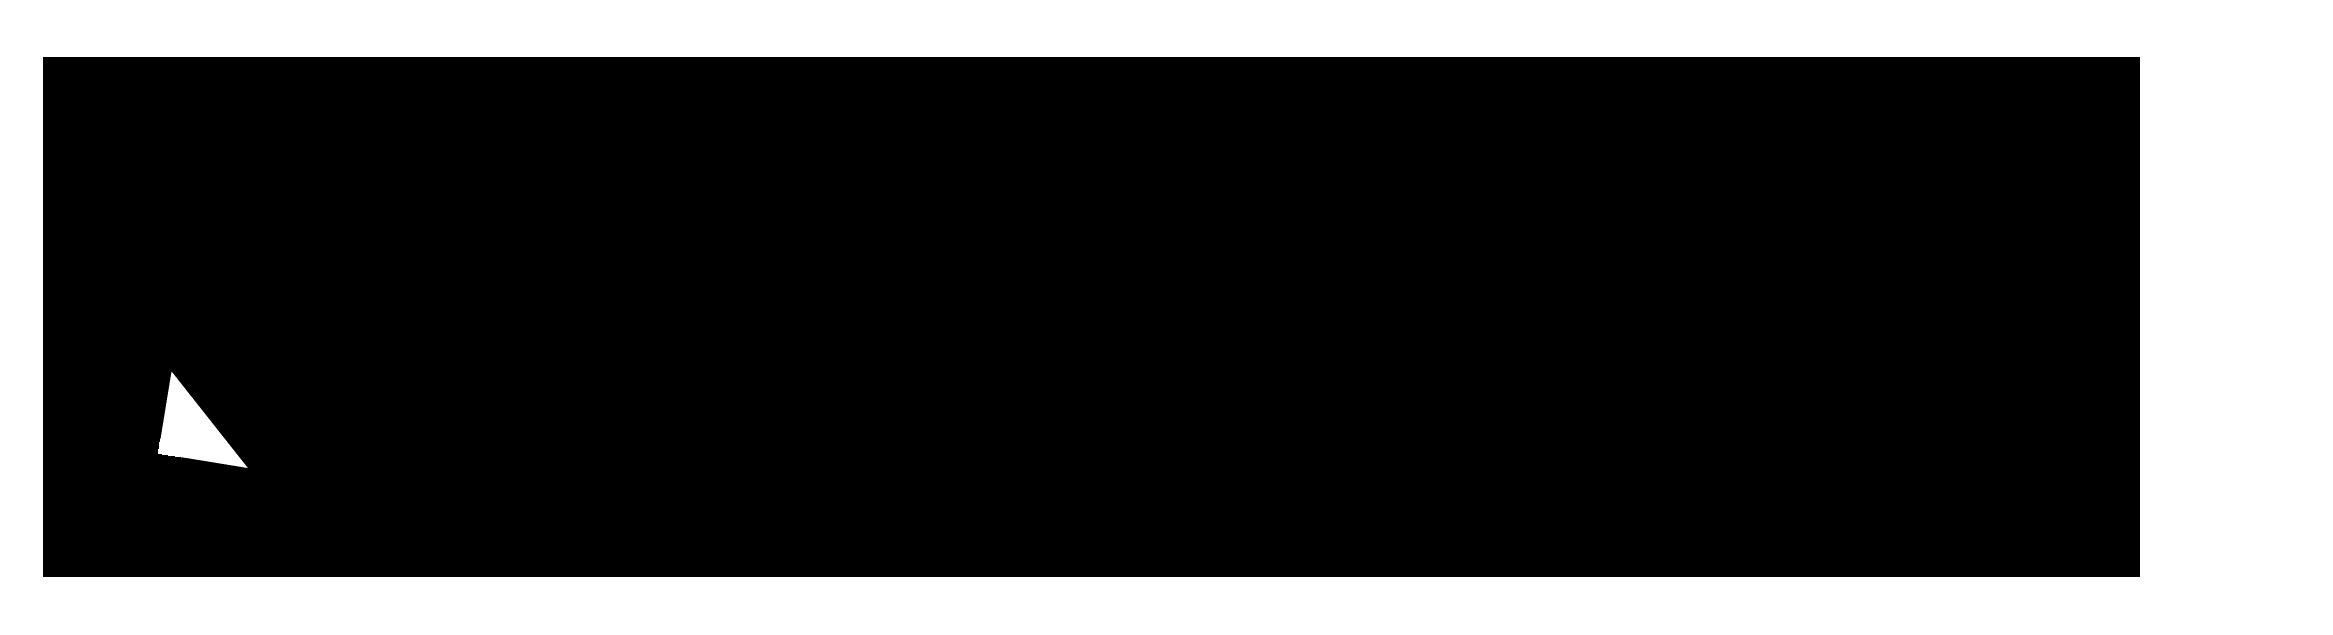 Ecksclusive International Business Development Logo pxmedia